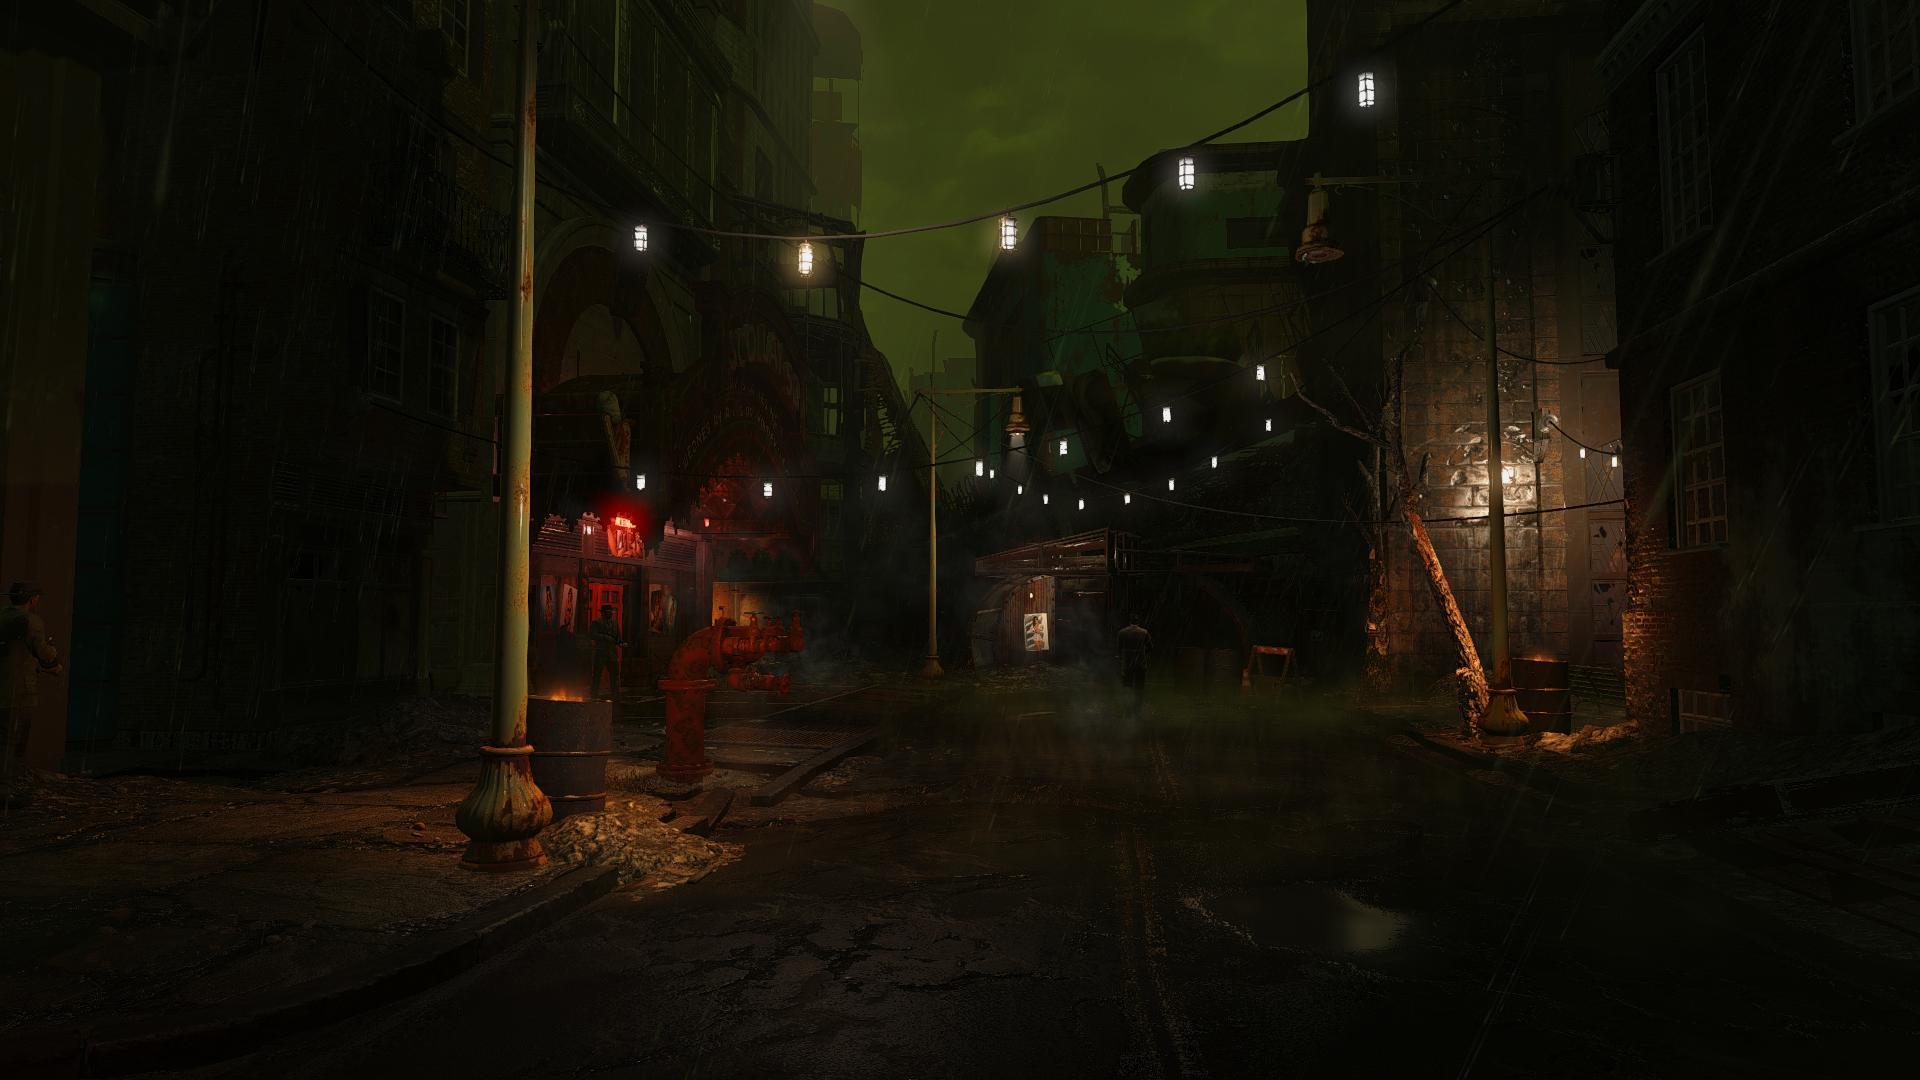 000470.Jpg - Fallout 4